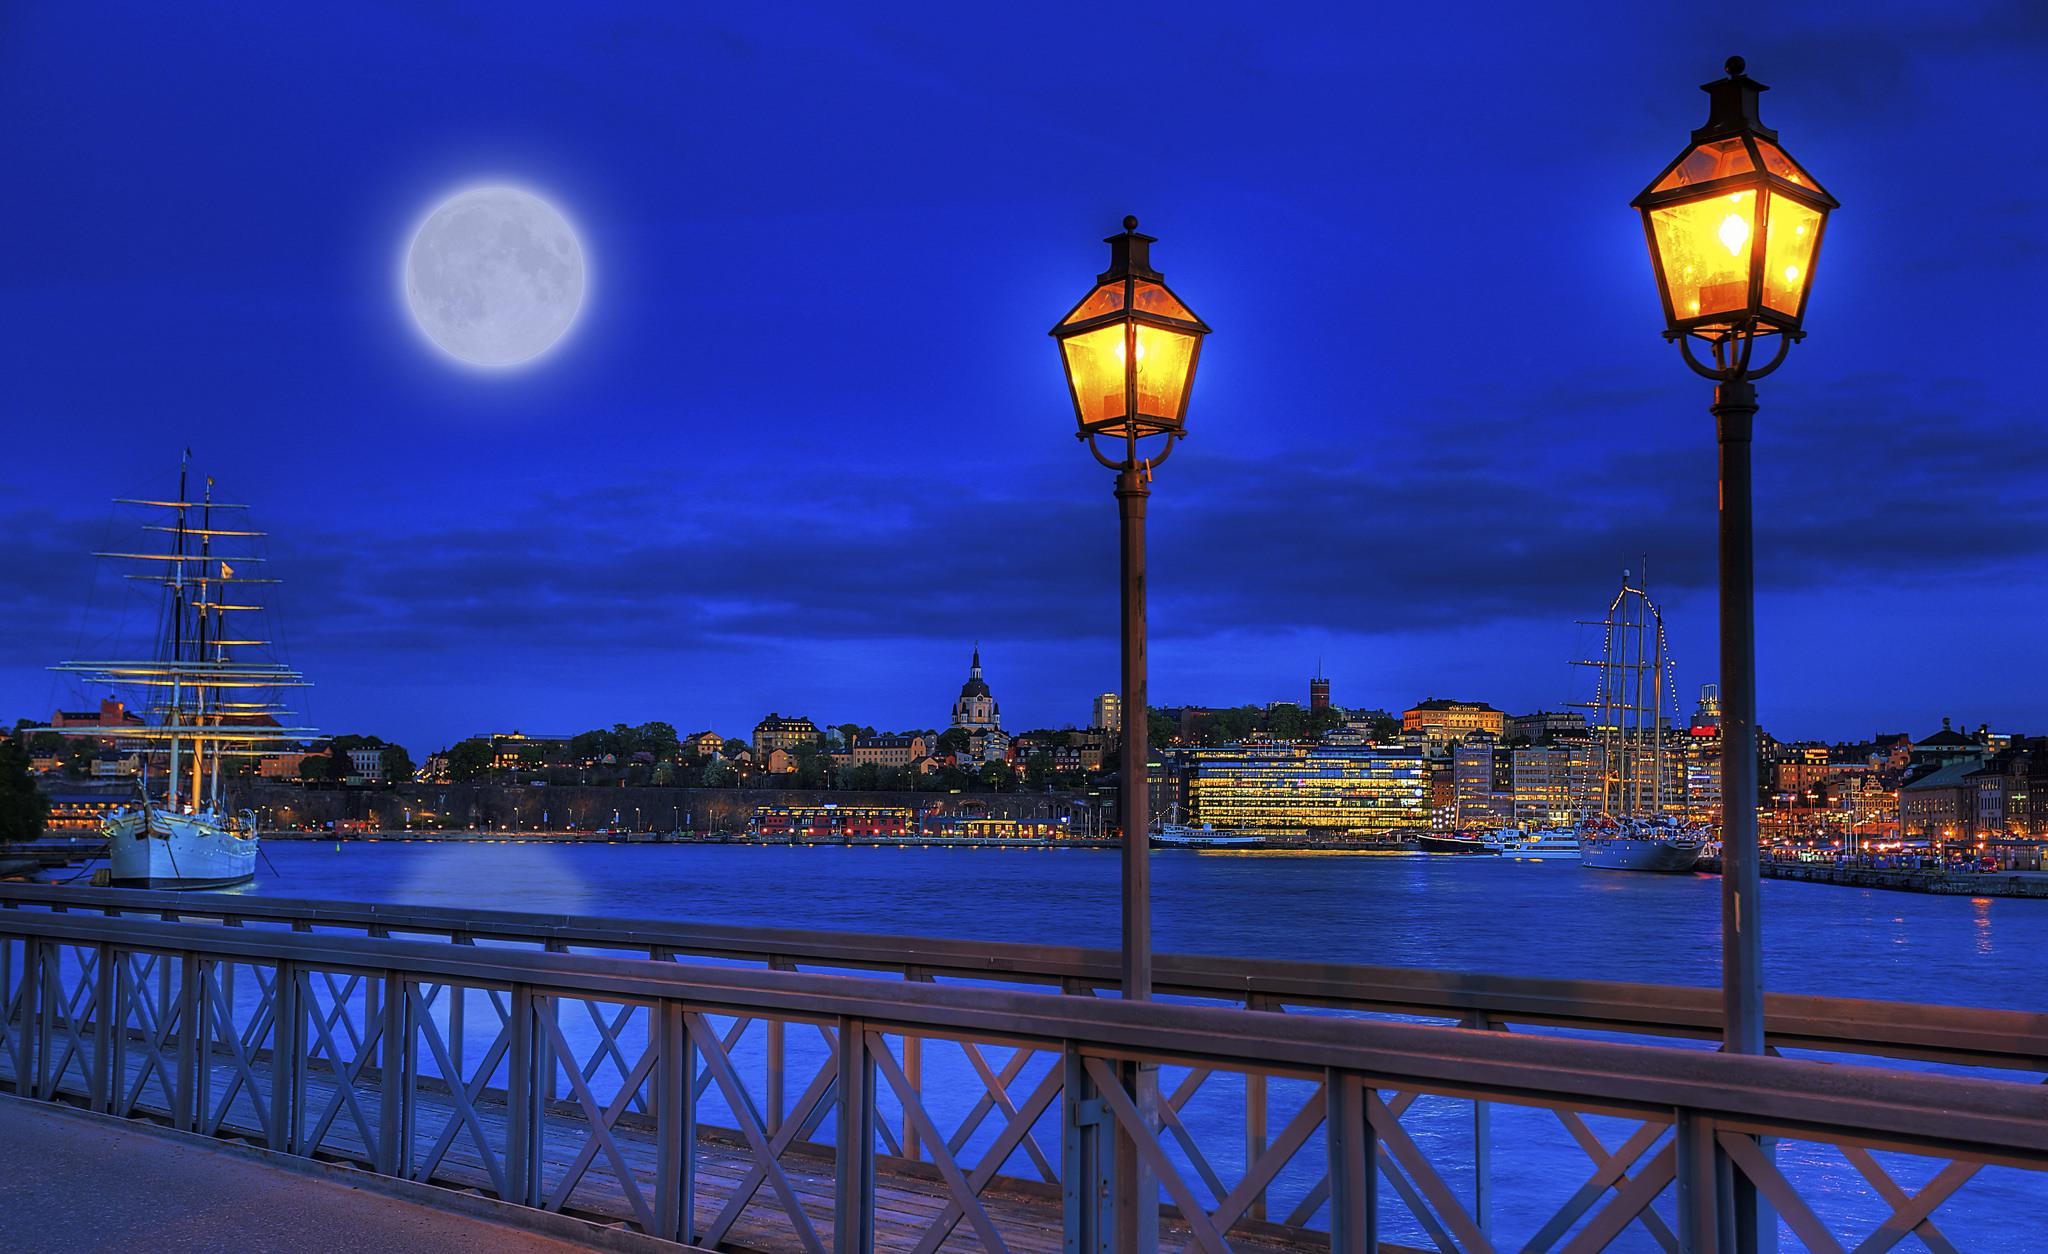 spring moon over Stockholm